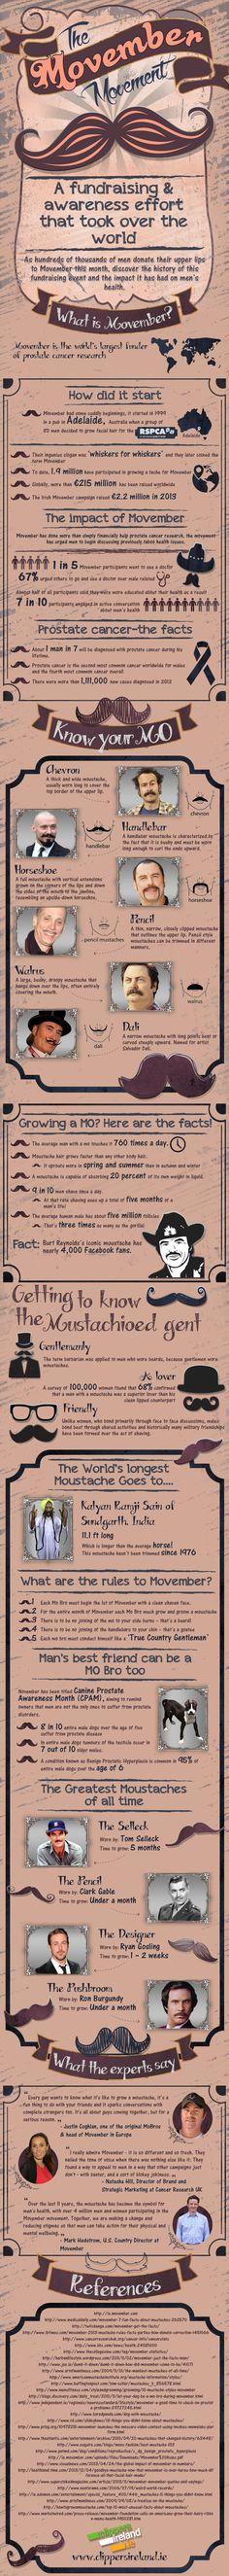 Movember – Do You Know Your Mo - Do you fancy an infographic? There are a lot of them online, but if you want your own please visit http://www.linfografico.com/prezzi/ Online girano molte infografiche, se ne vuoi realizzare una tutta tua visita http://www.linfografico.com/prezzi/